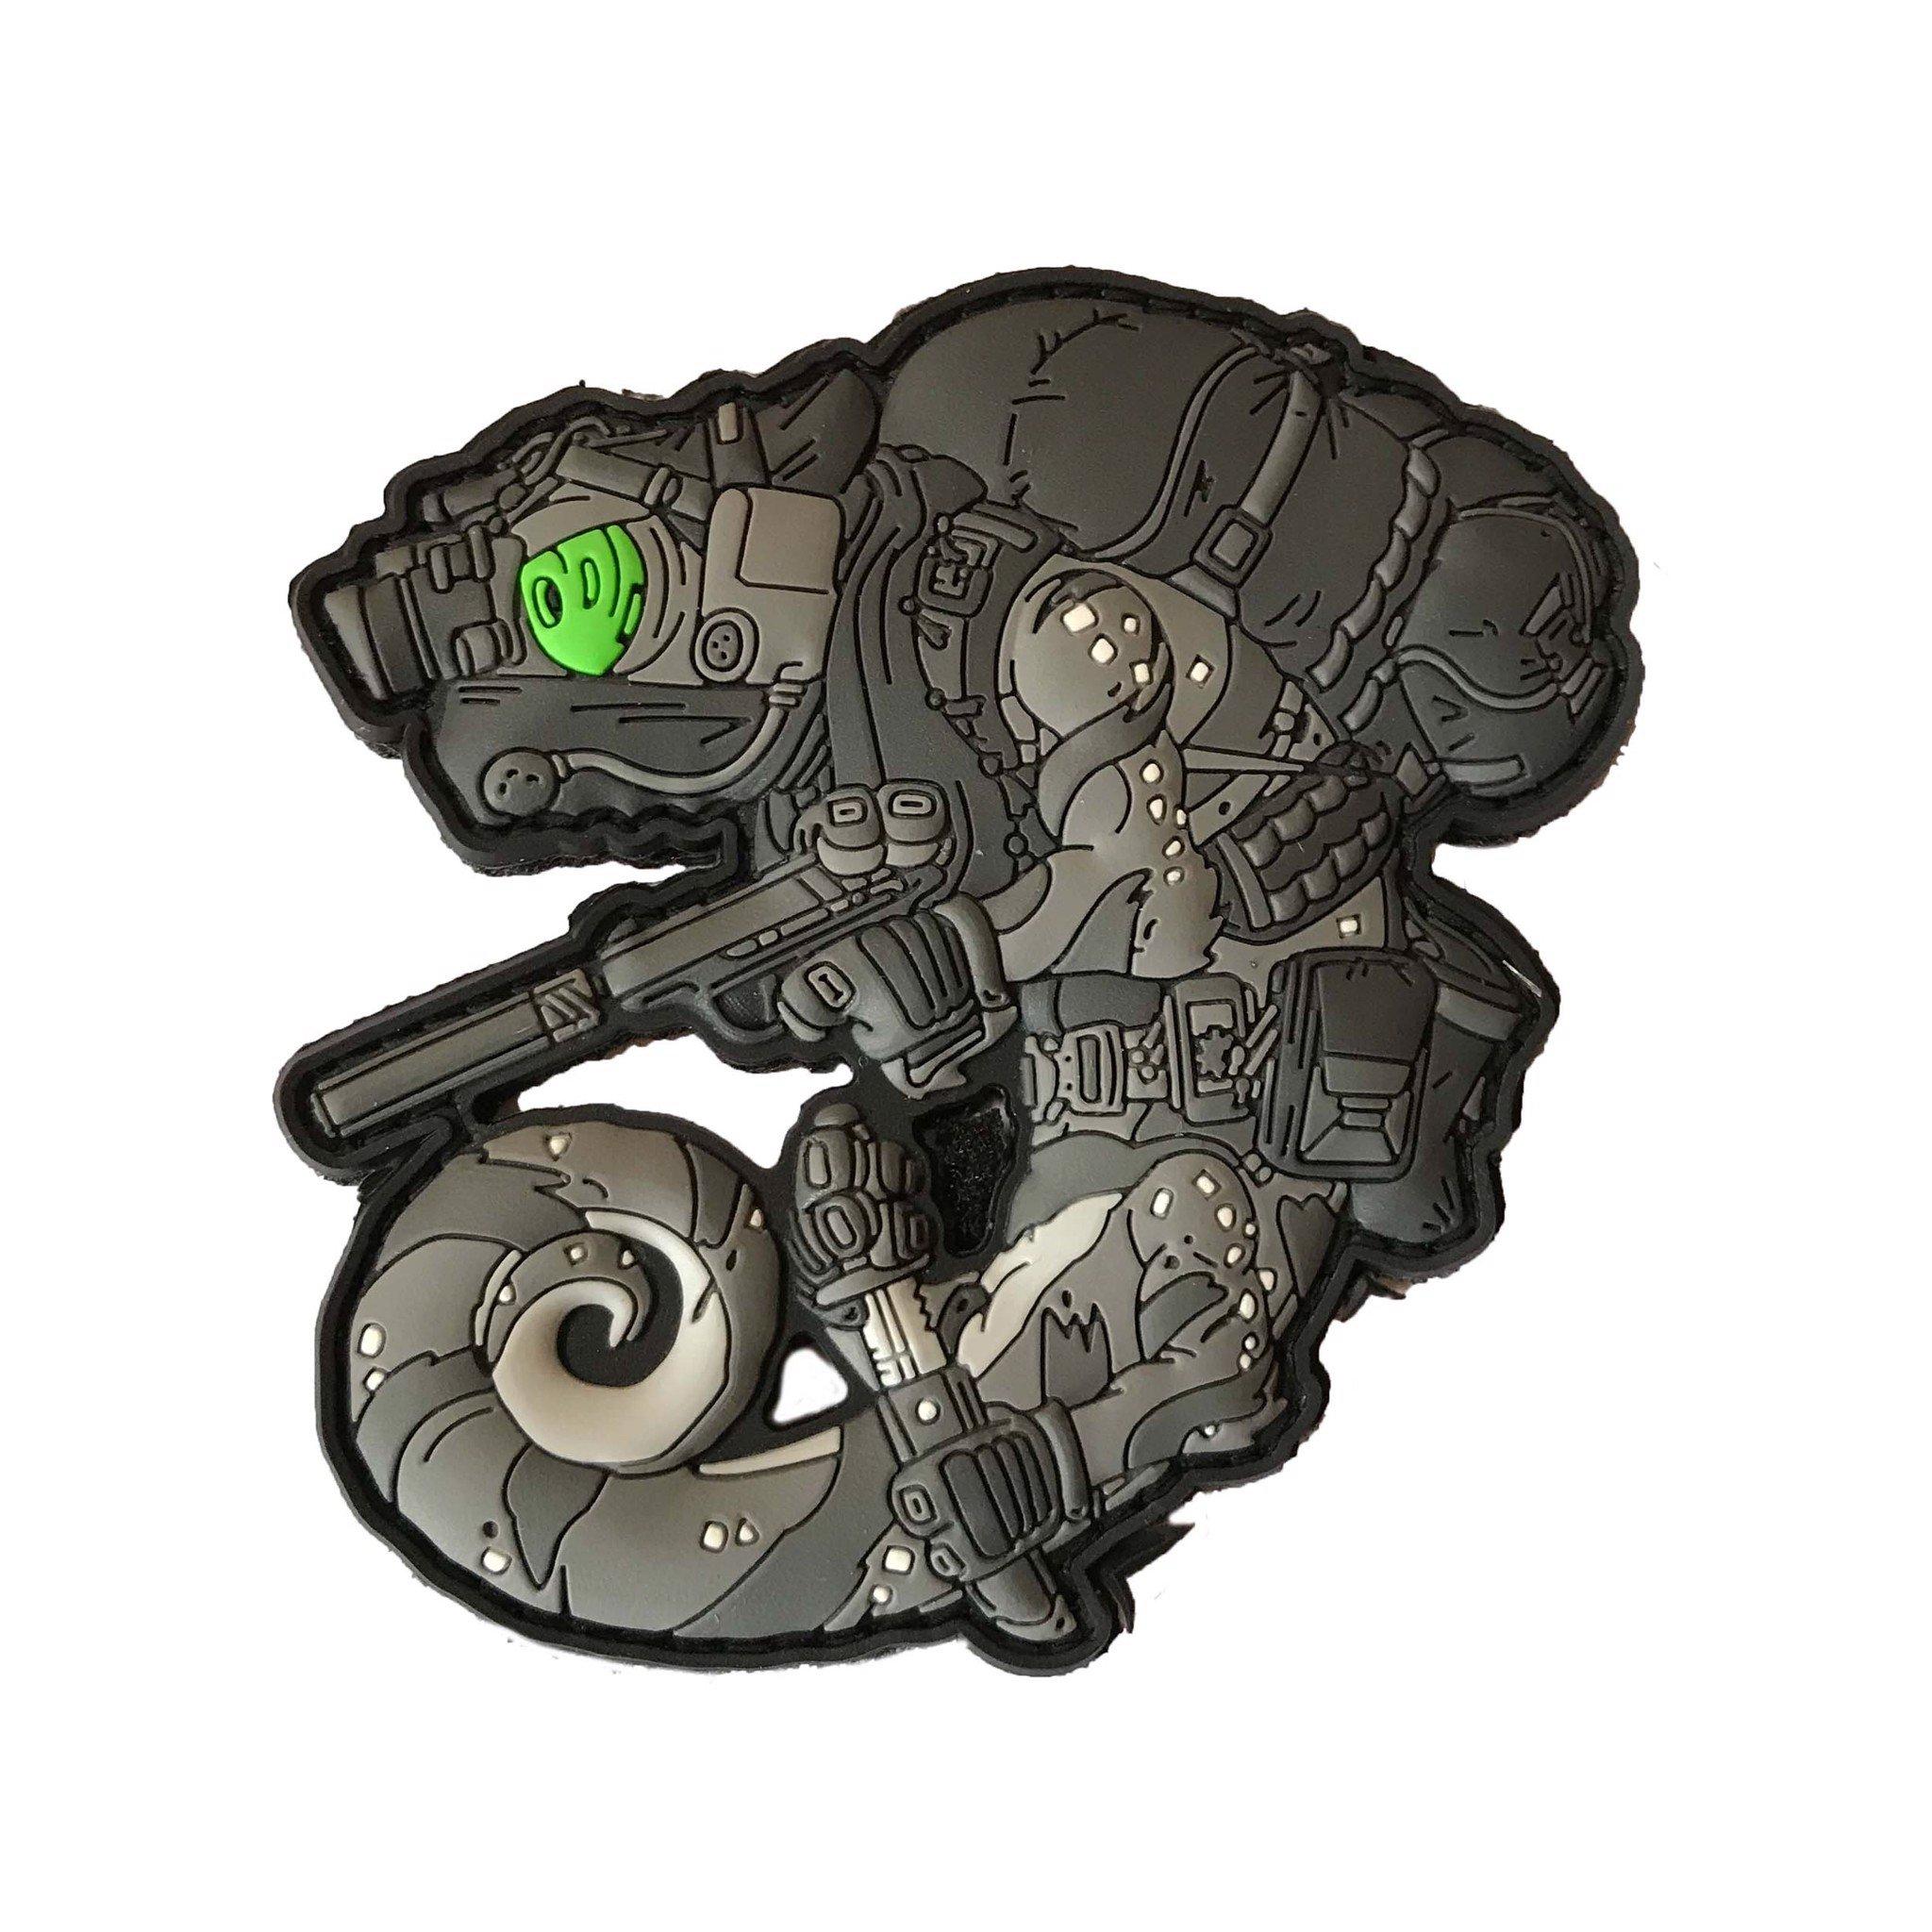 Tacopsgear Tactical Chameleon Legion NightsTalker V3 Patch